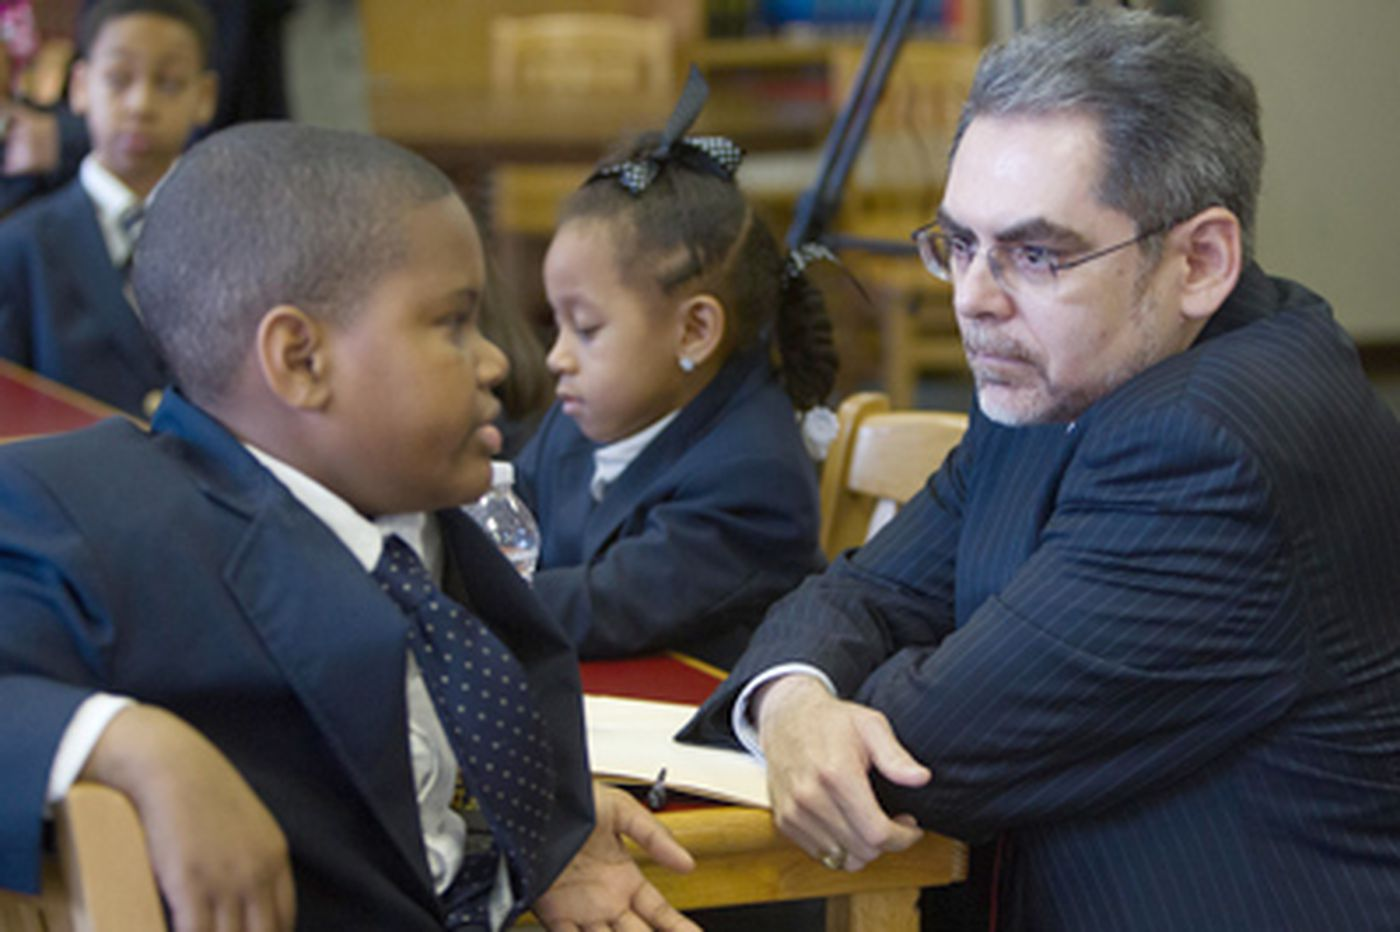 Nutter taking aim at low-performing Philadelphia schools